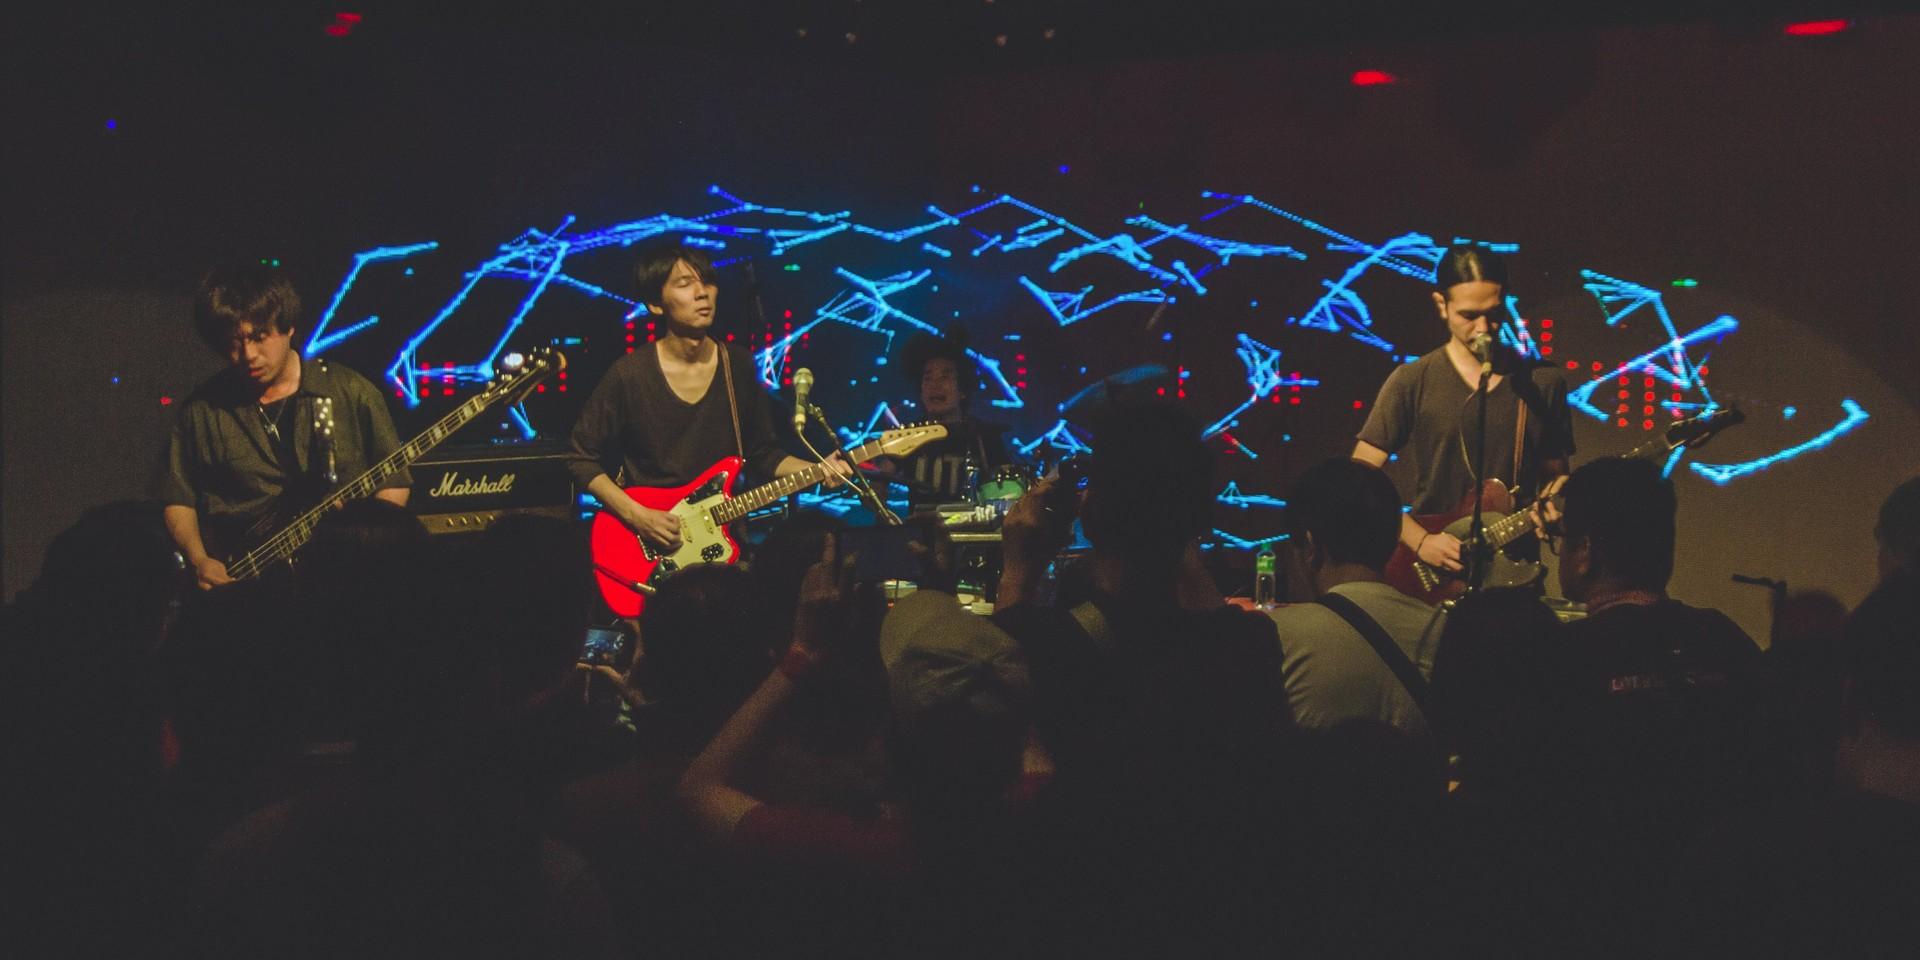 PHOTO GALLERY: LITE Live in Manila